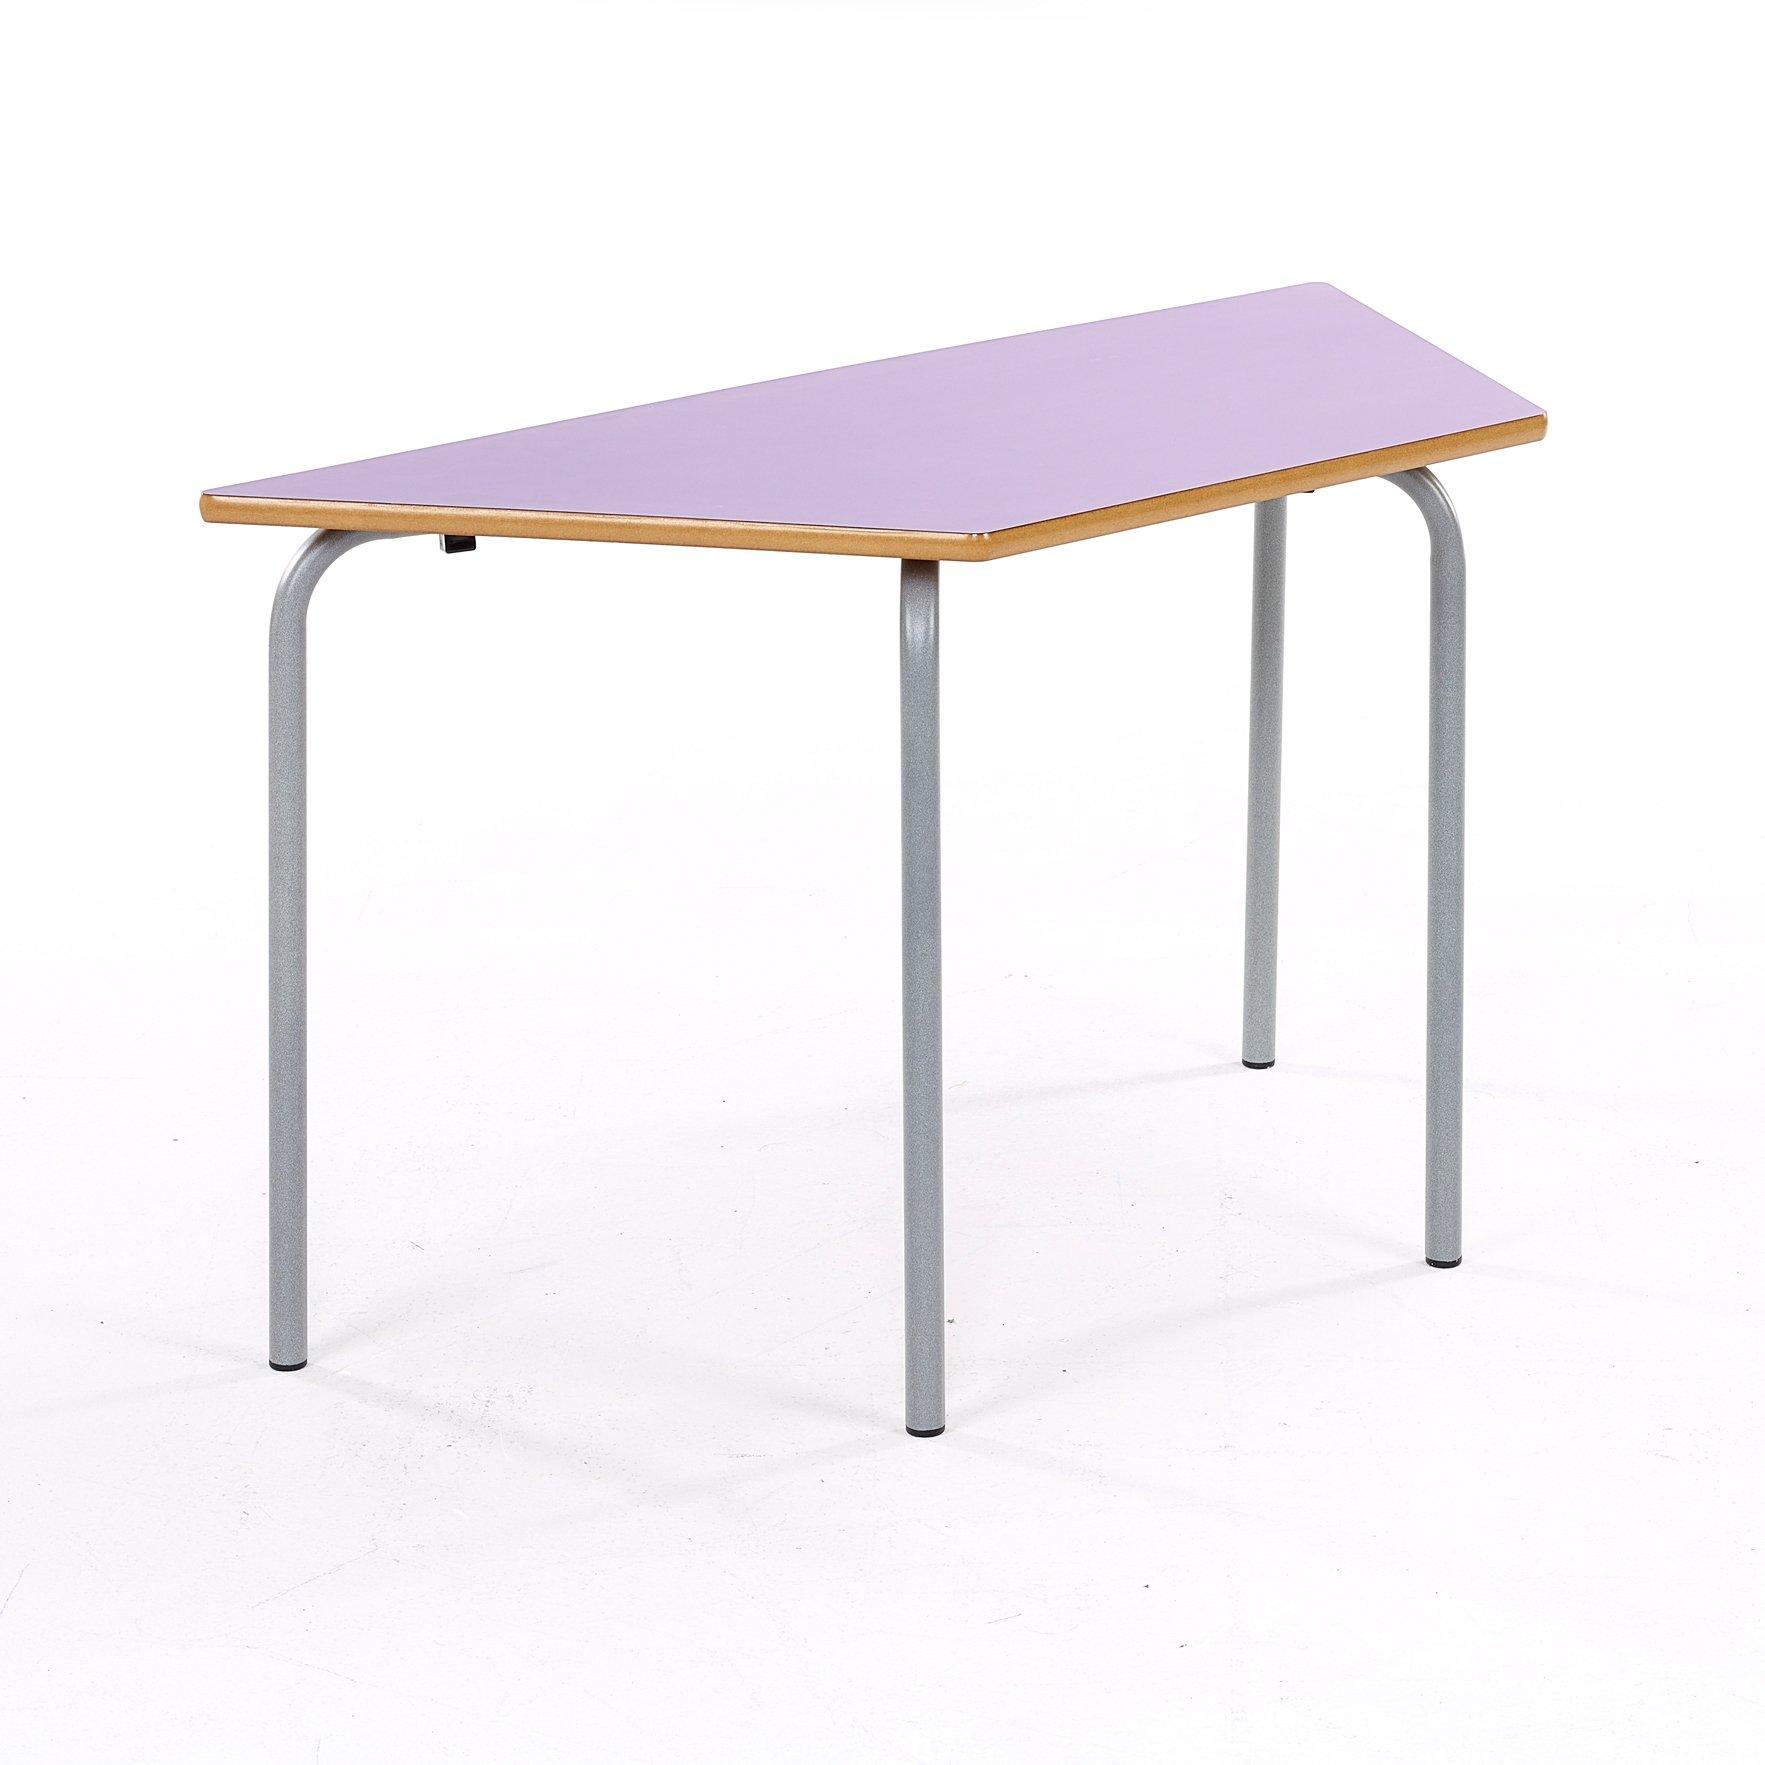 Metalliform standard nursery trapezoidal table mdf for Trapazoid table